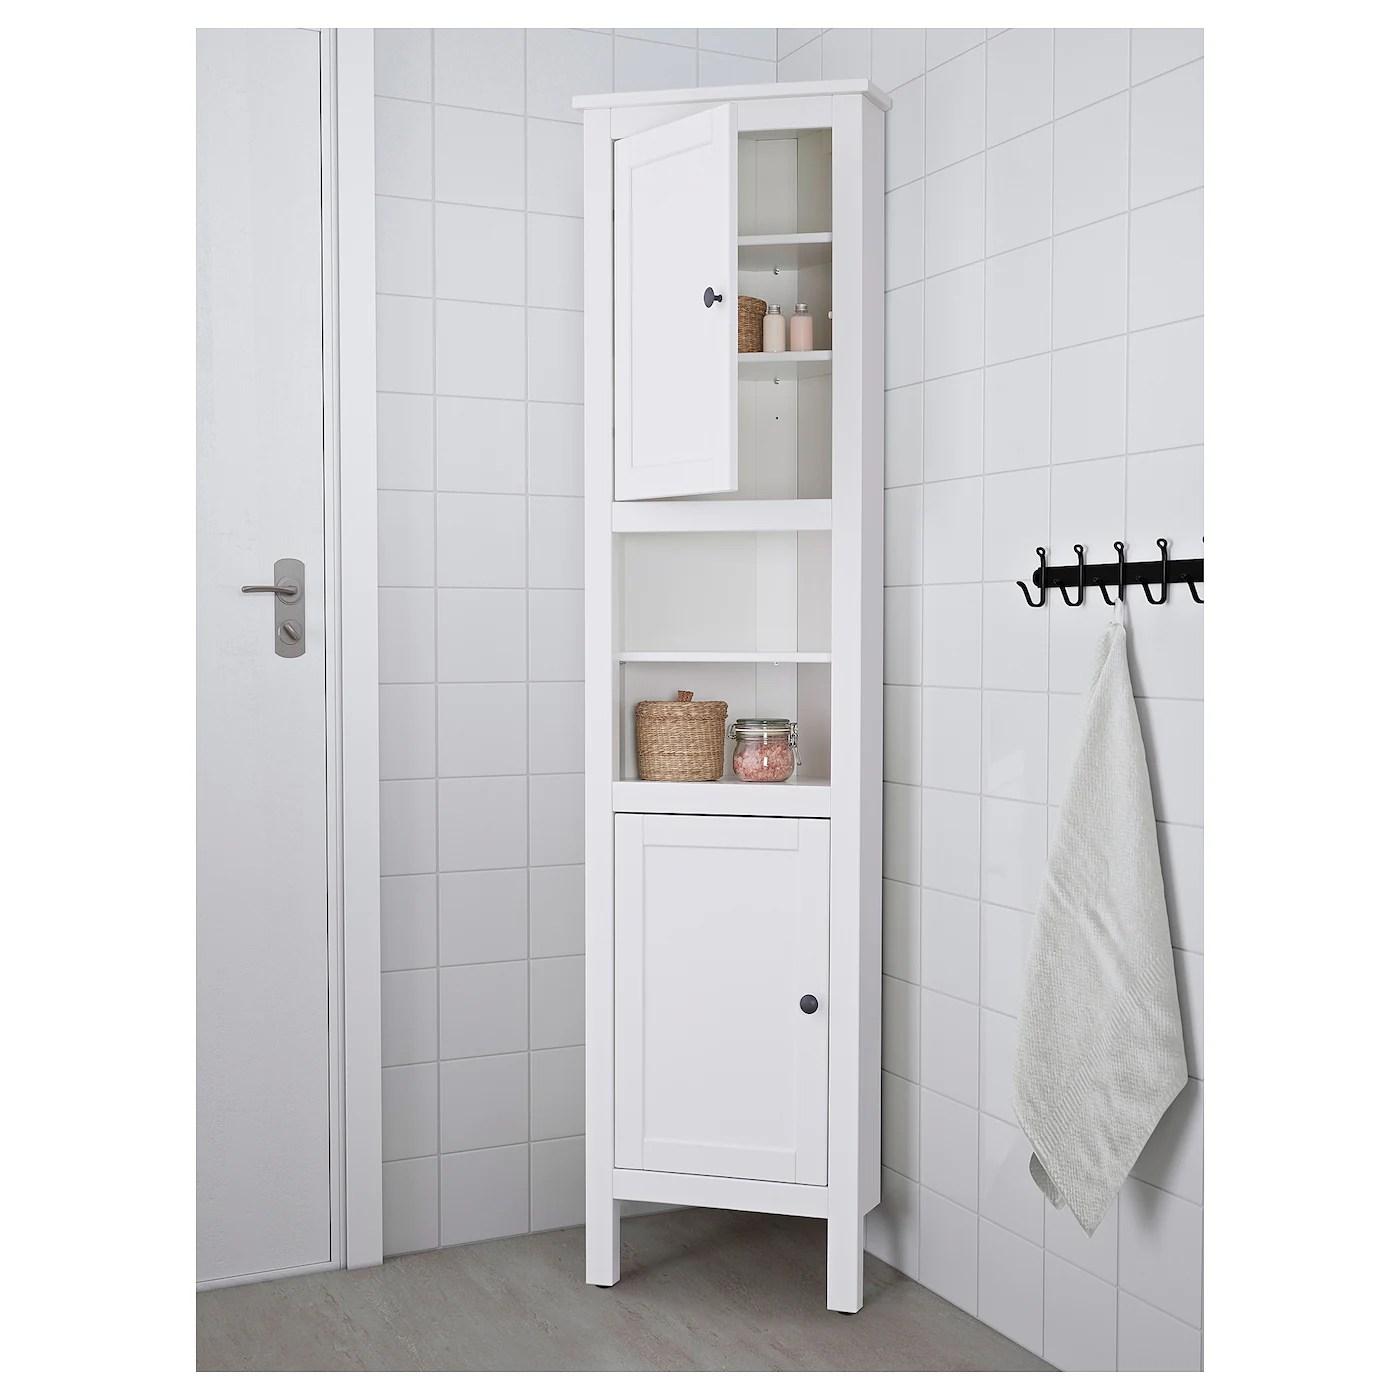 hemnes meuble d angle blanc 20 1 2x14 5 8x78 3 8 52x37x199 cm